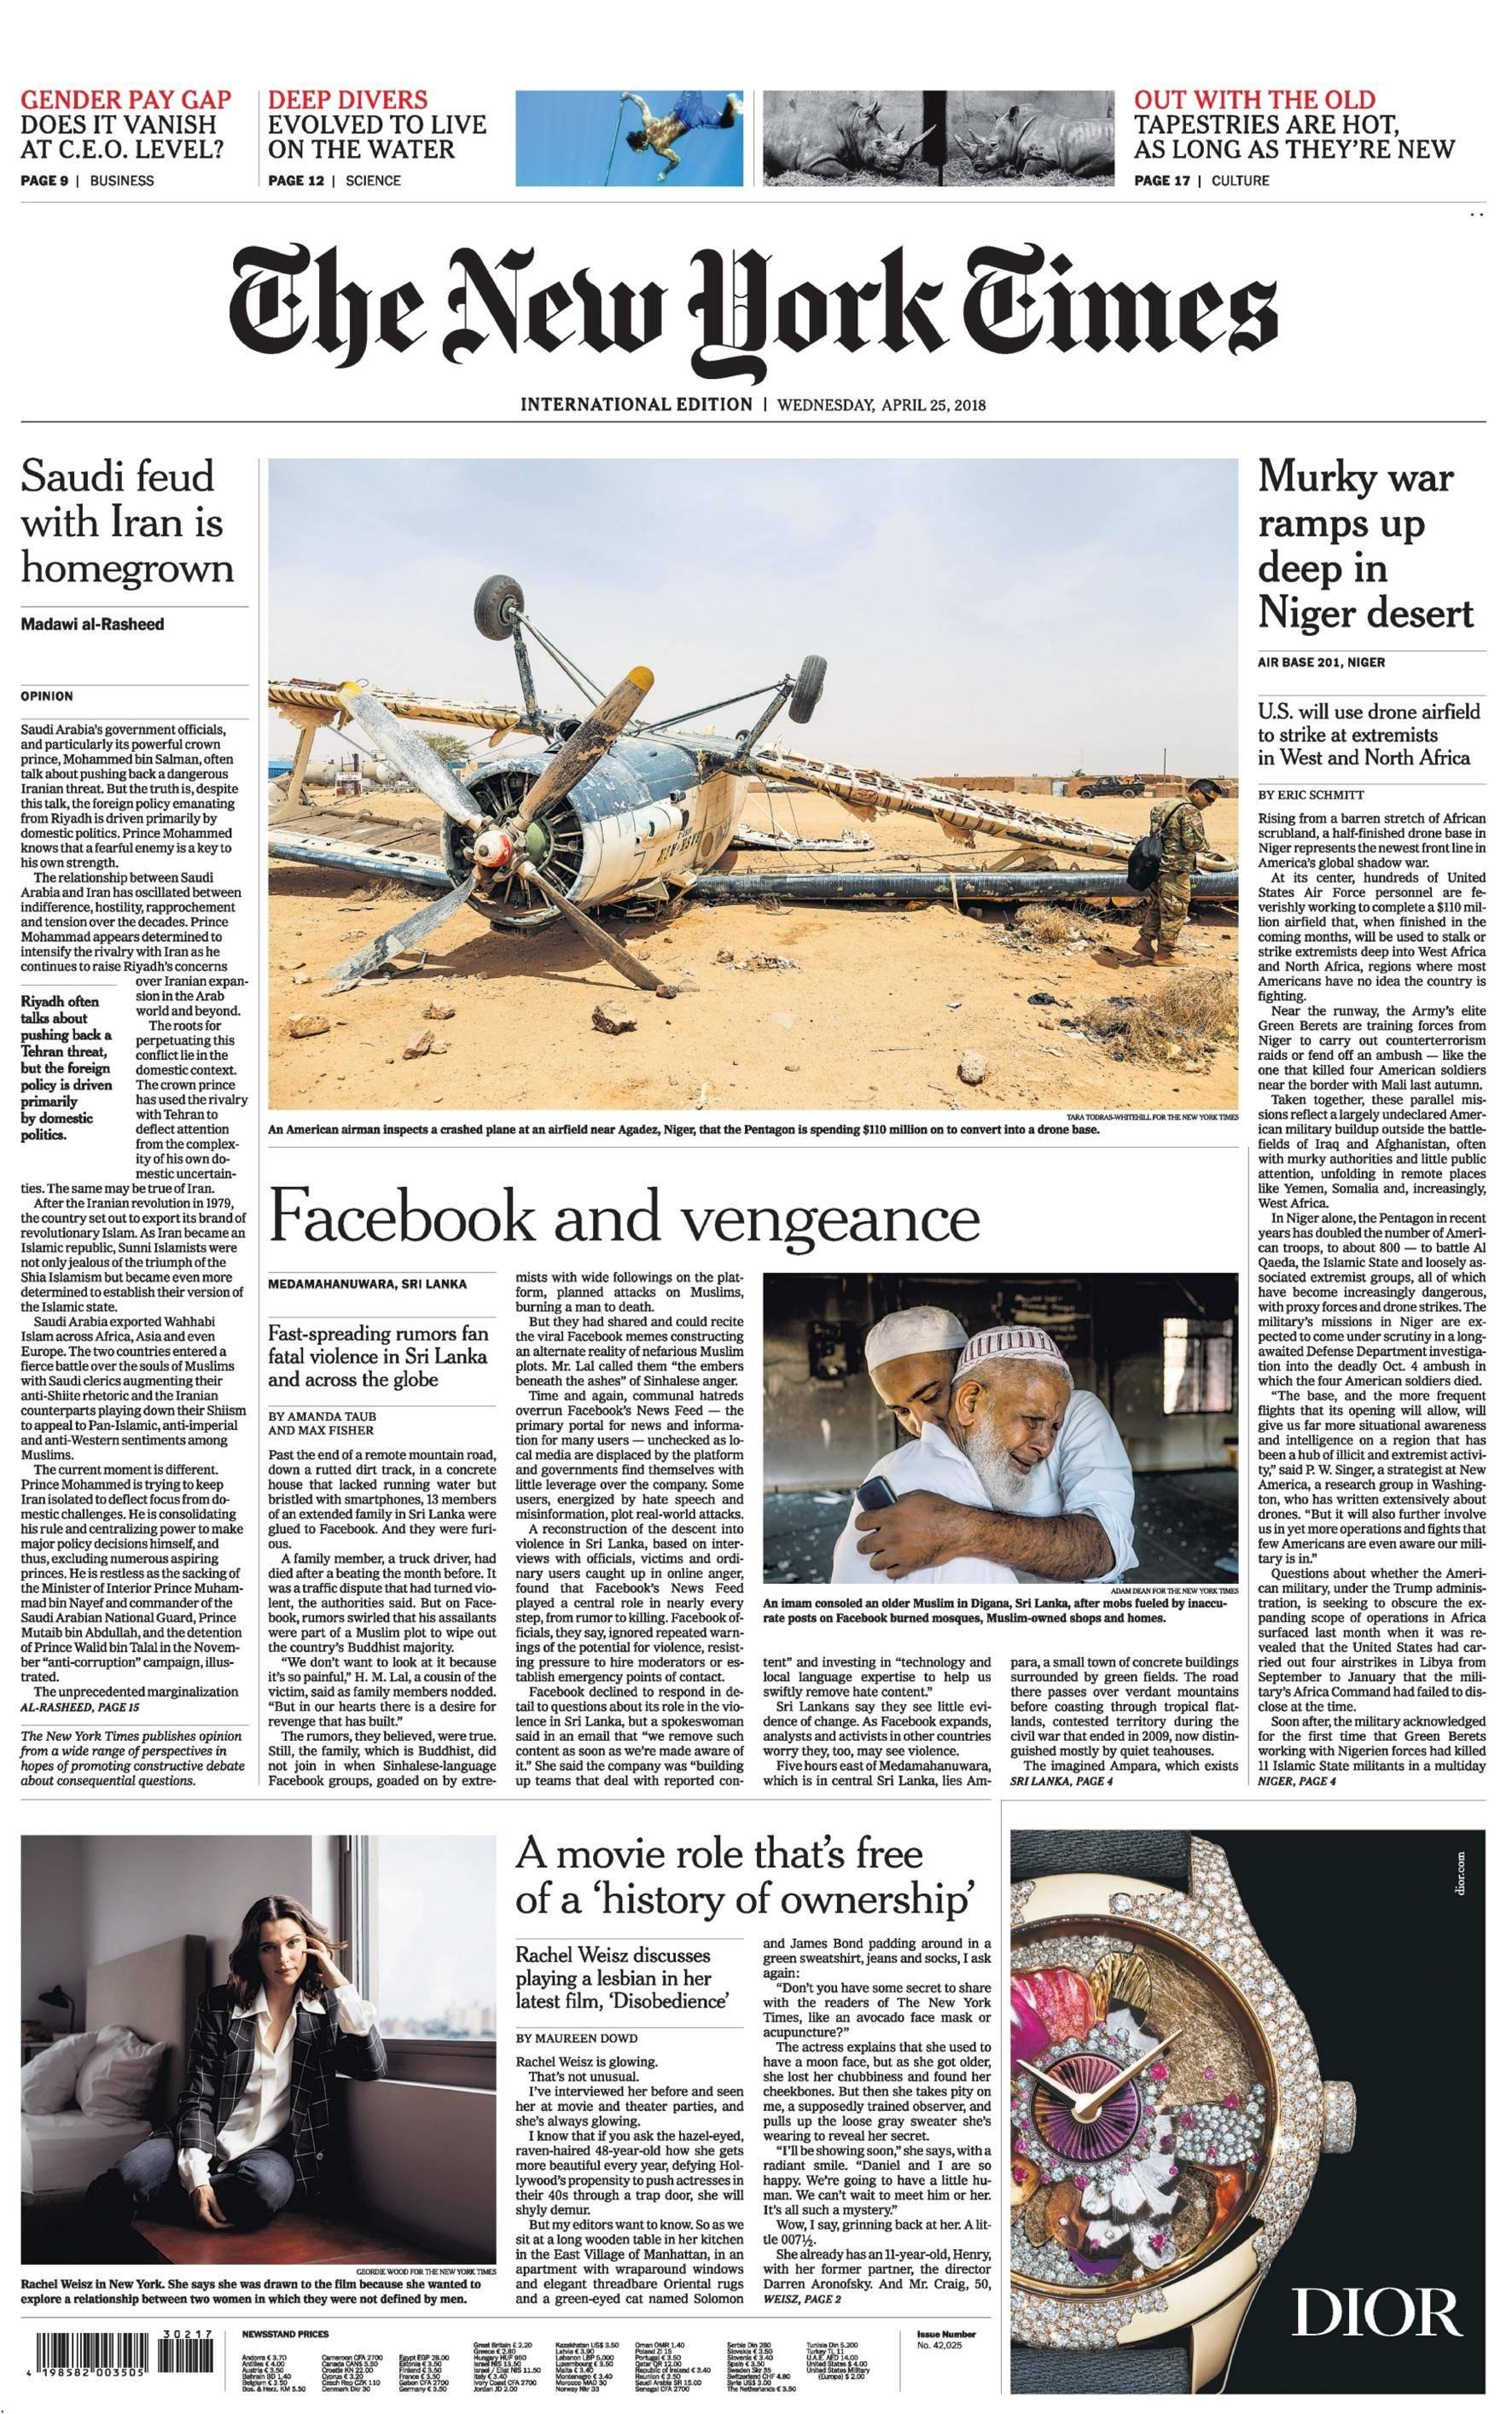 International New York Times - 25 April 2018